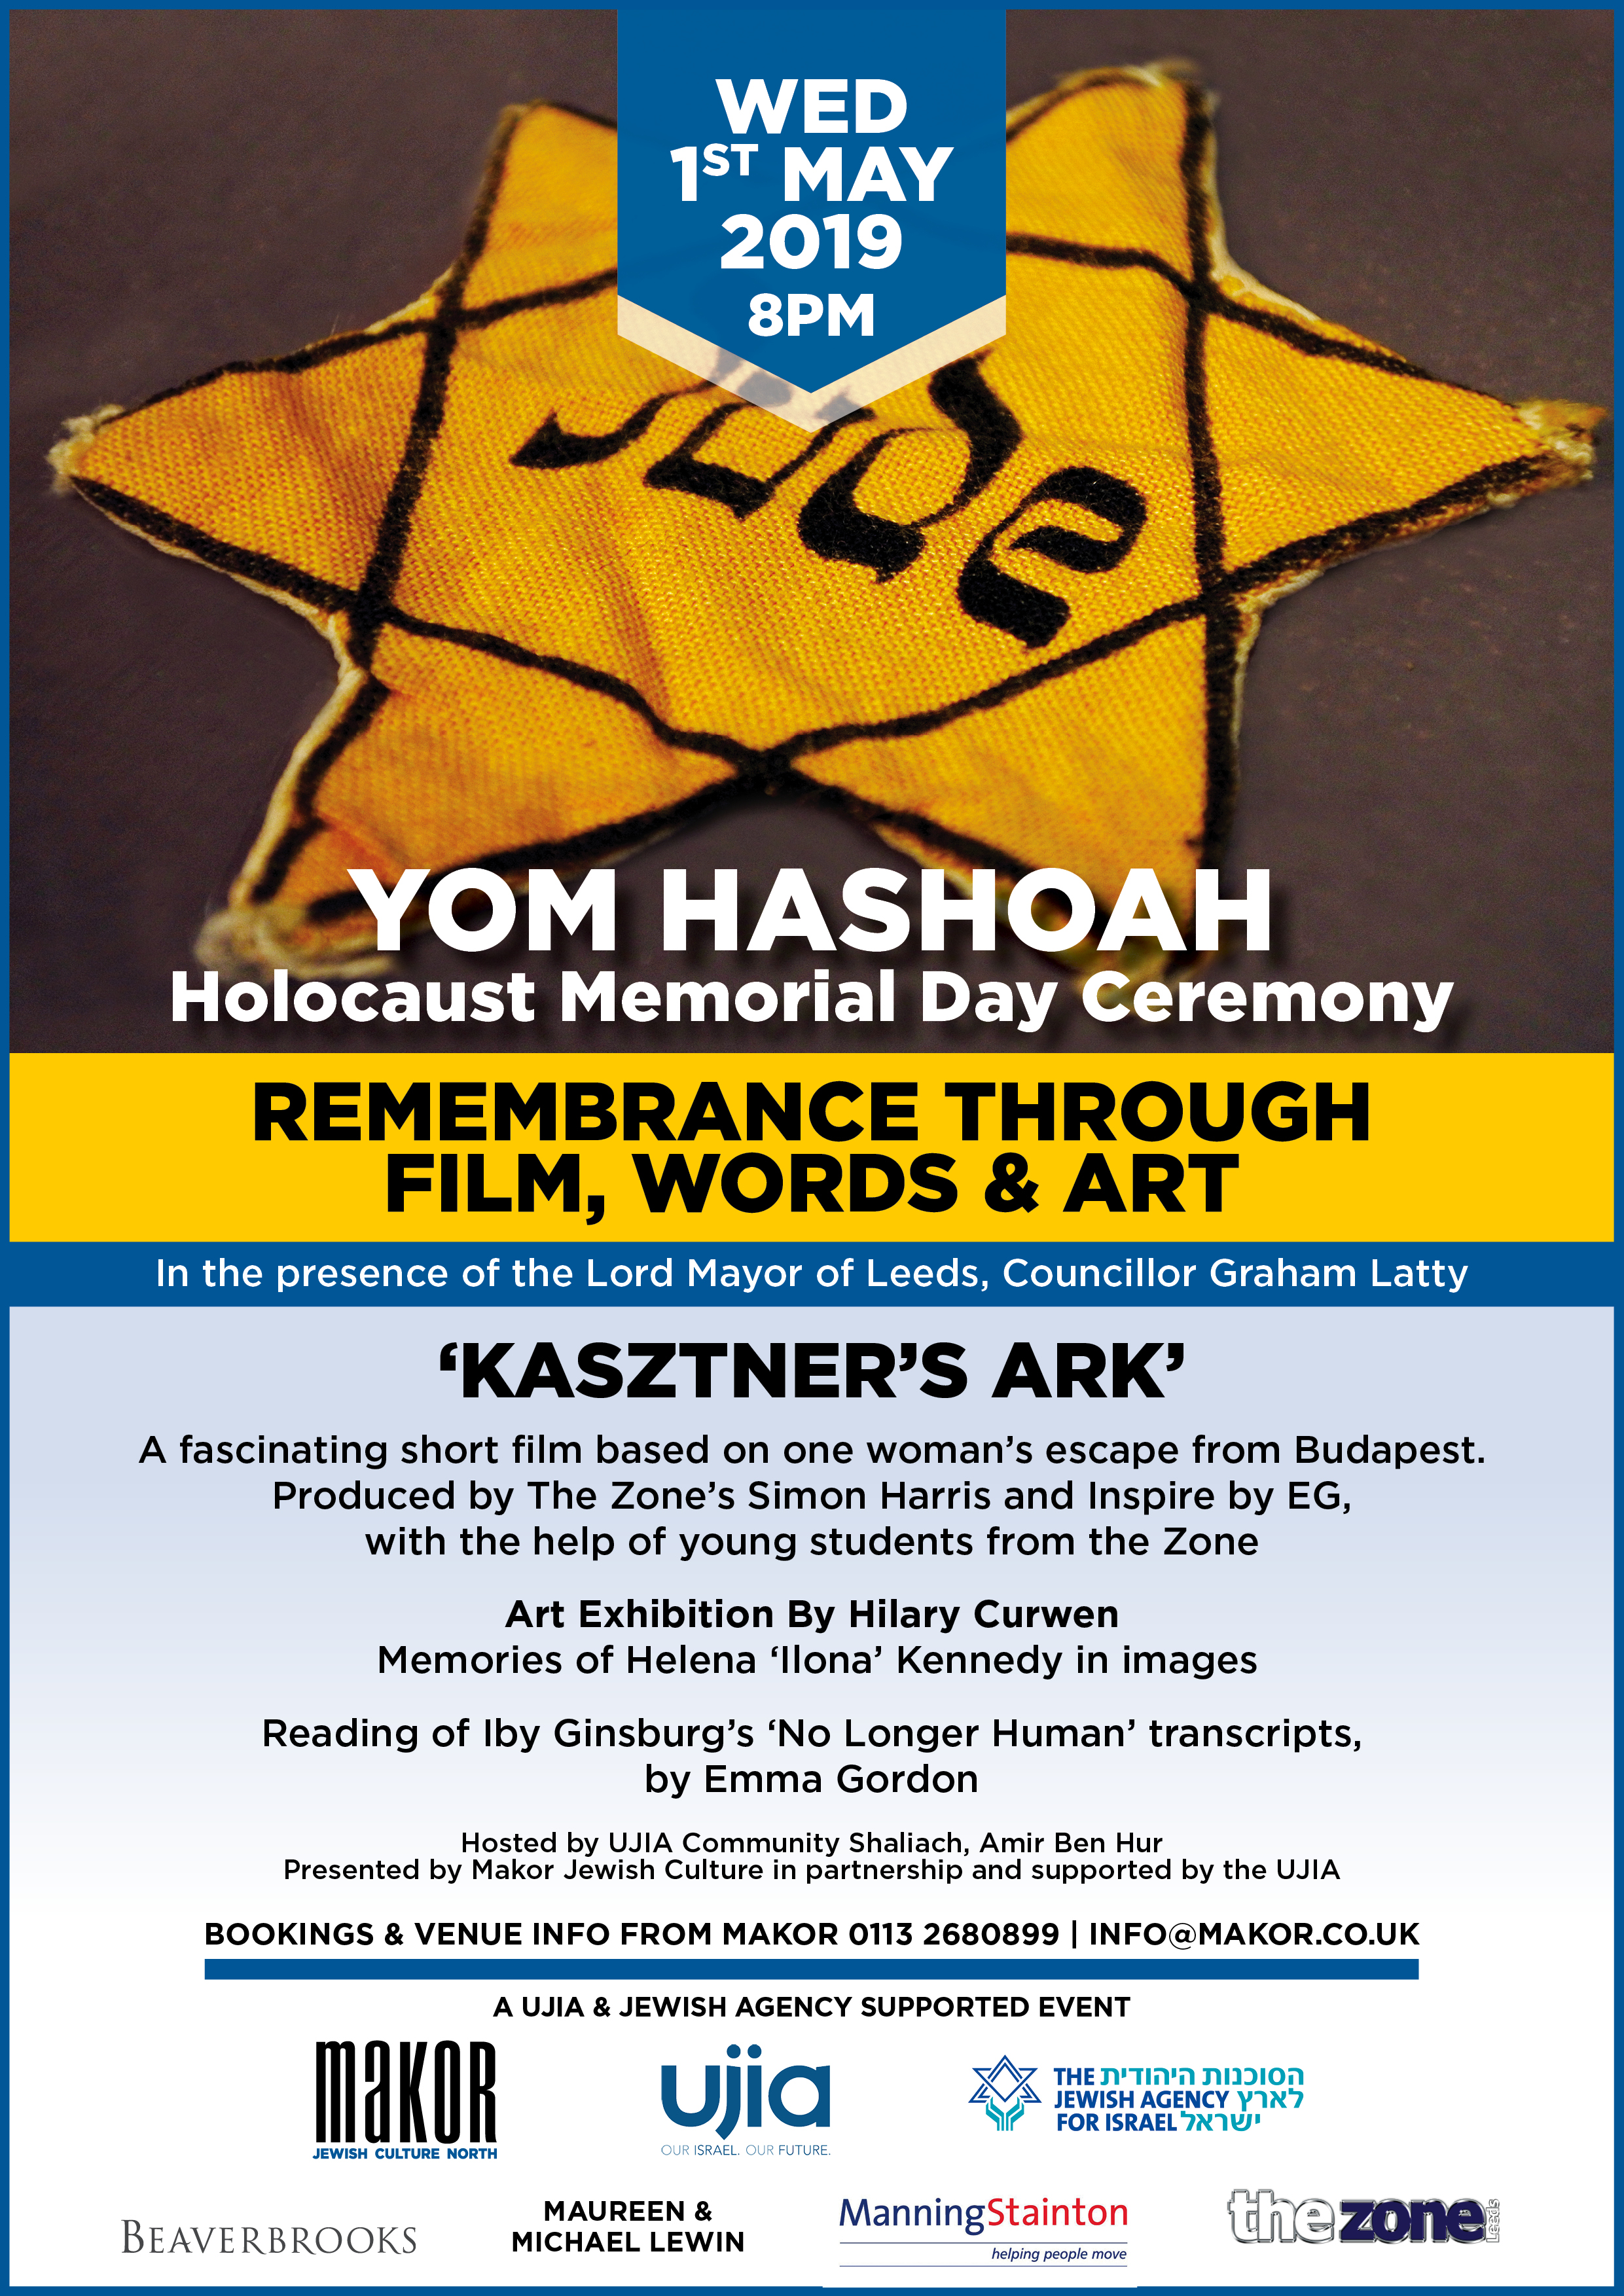 A4-Poster-Yom-Hashoah final